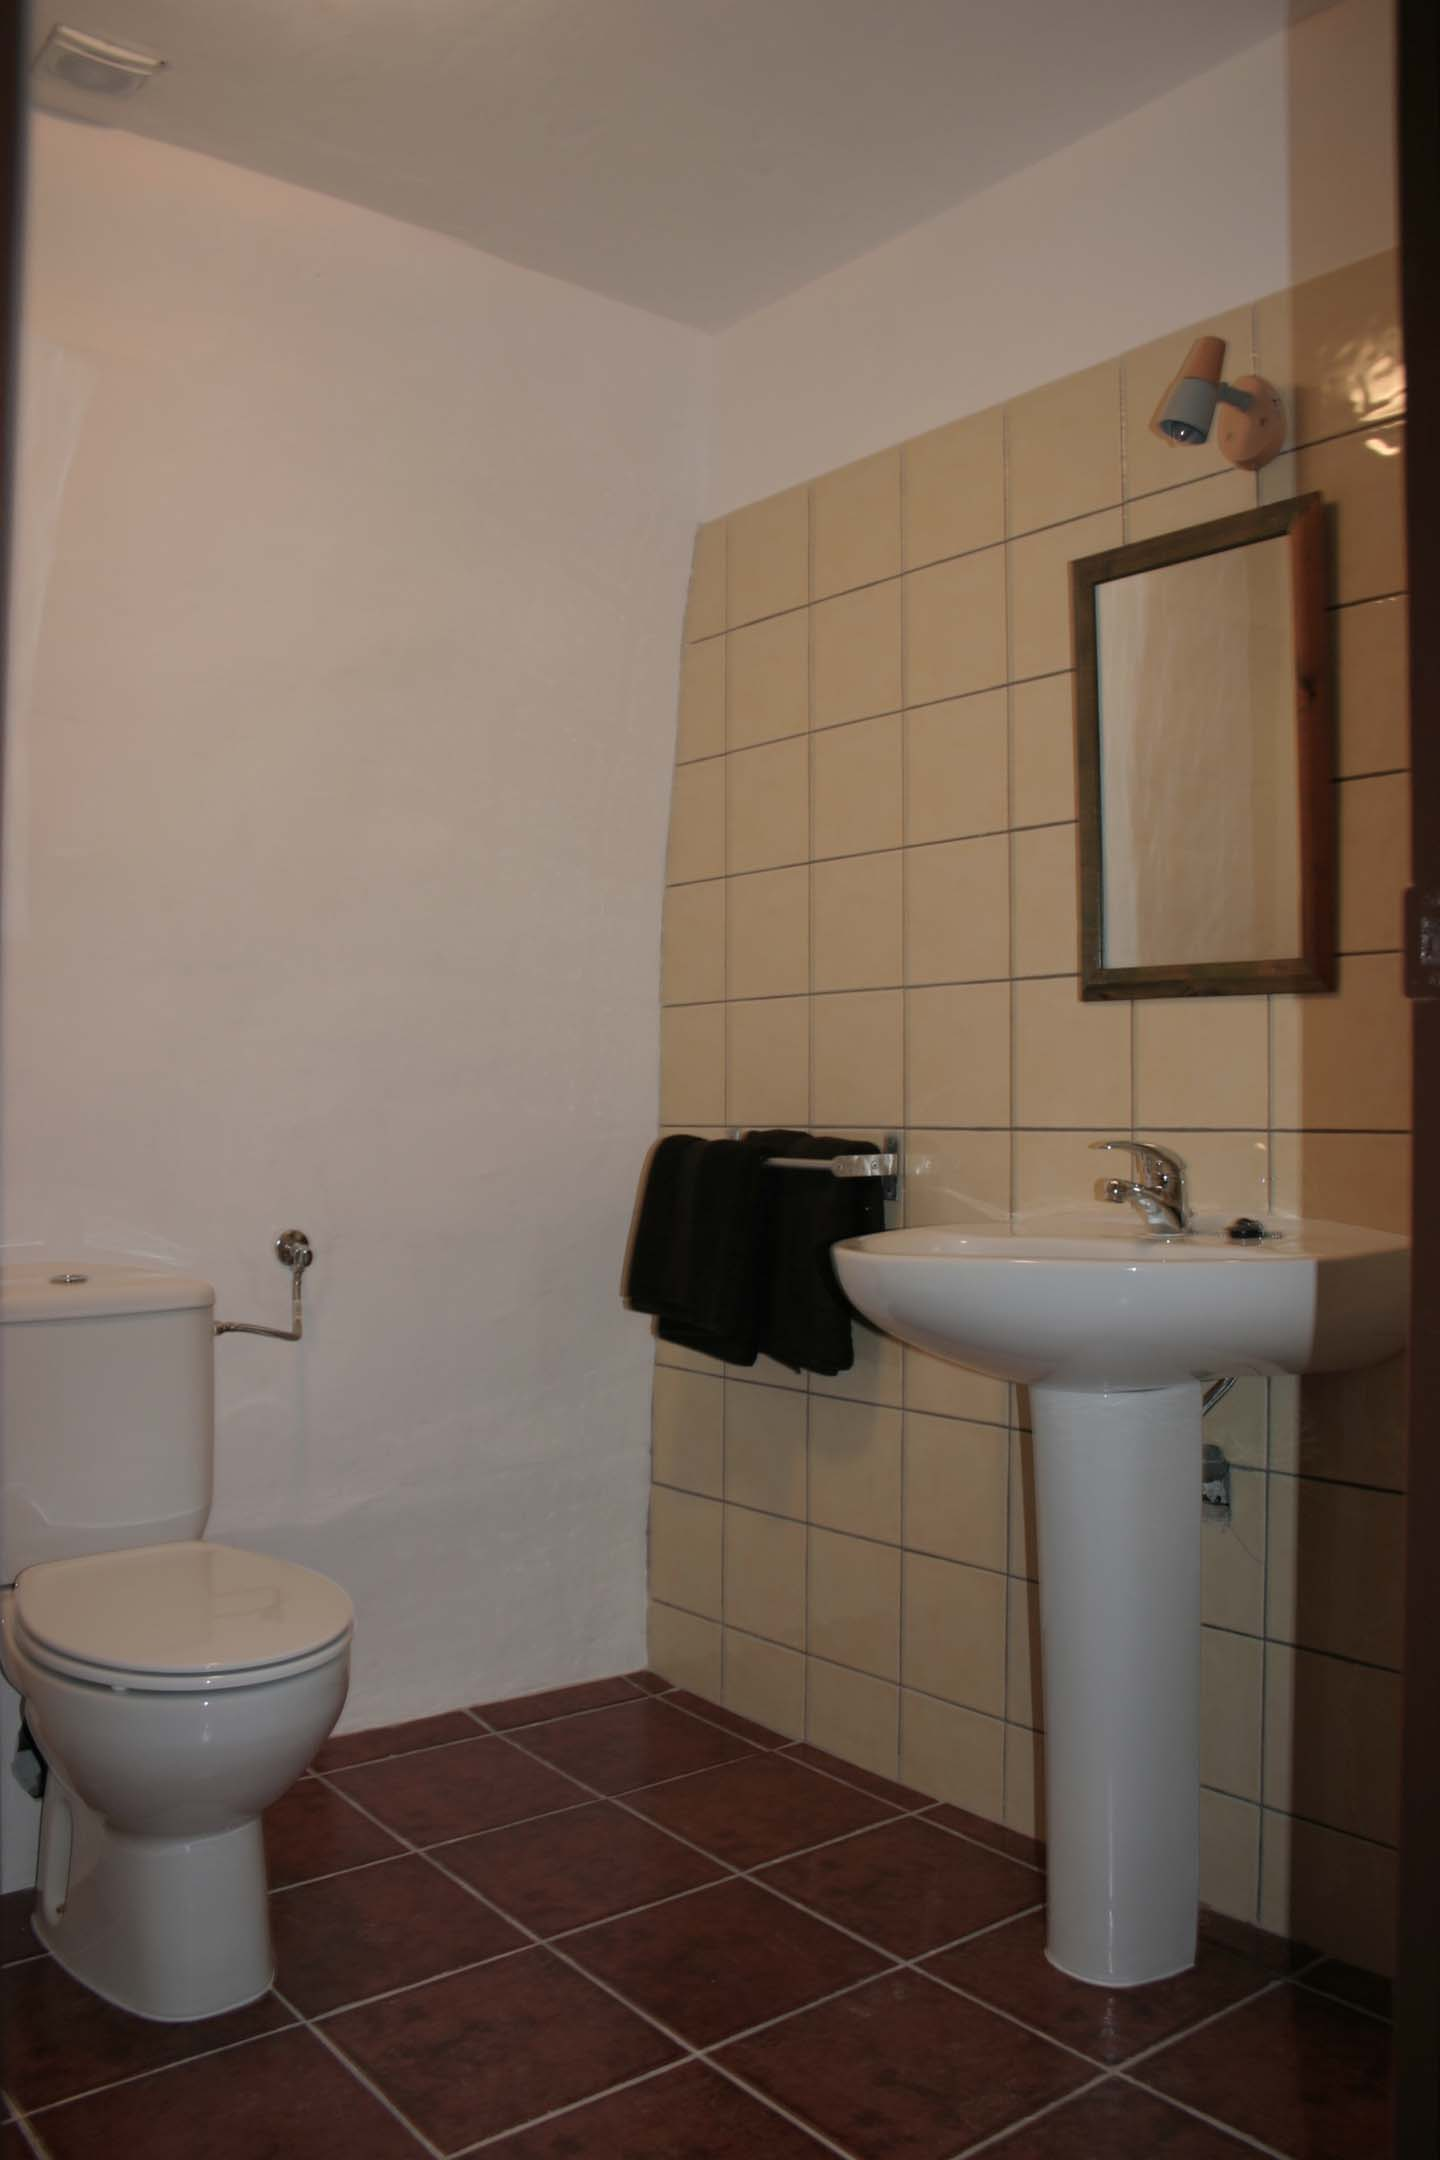 Appartementen te huur in de spaanse Pyreneeën - Casa de Castro